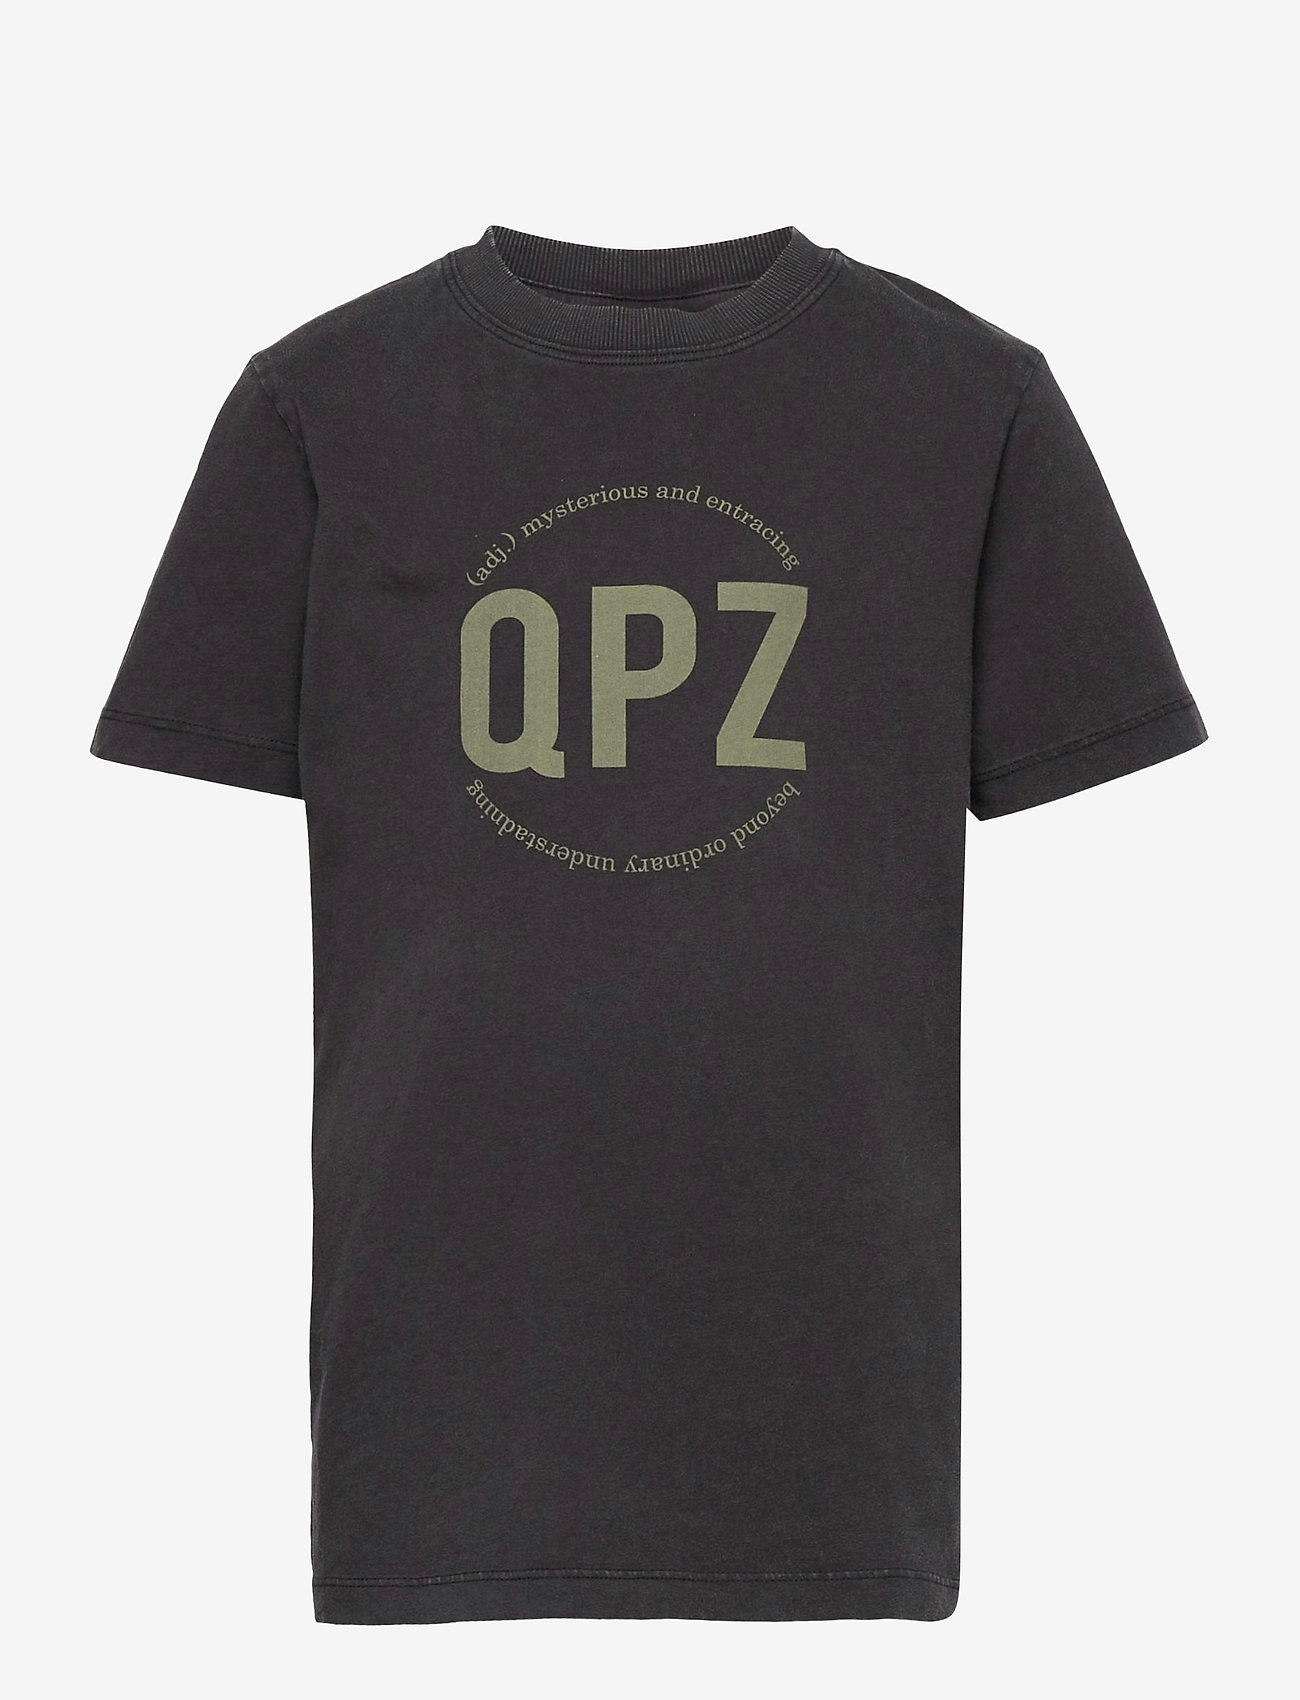 LMTD - NLMBASTIAN SS R TOP - t-shirts - black - 0